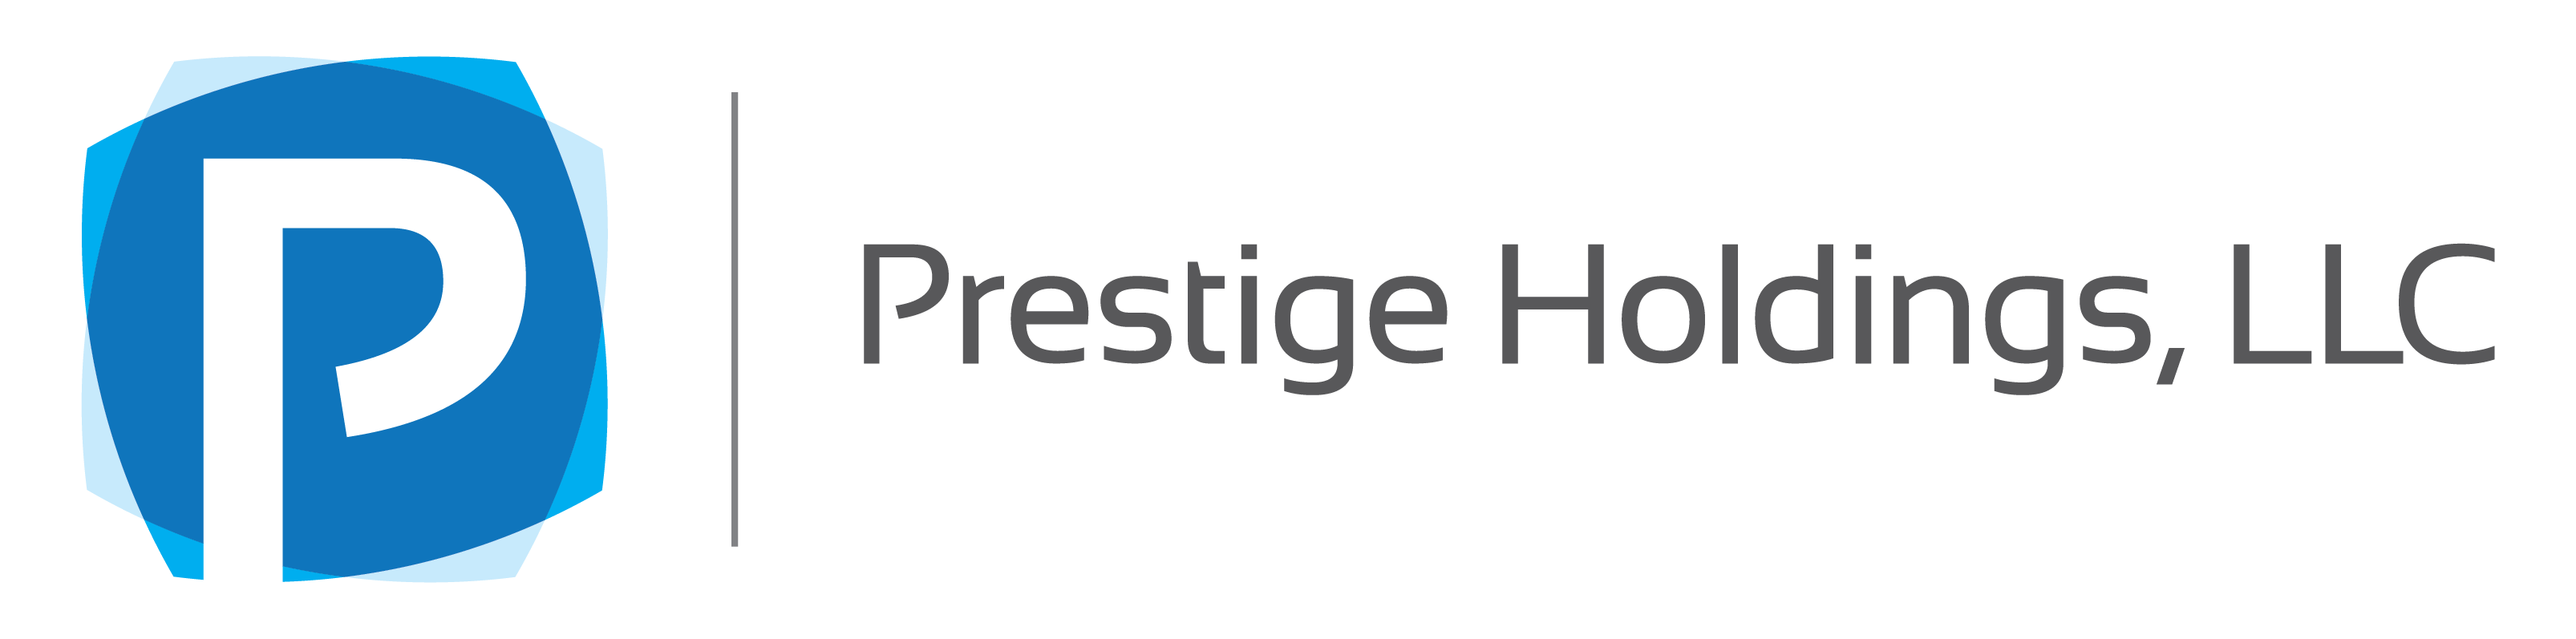 We'll Buy Your House | Prestige Holdings, LLC